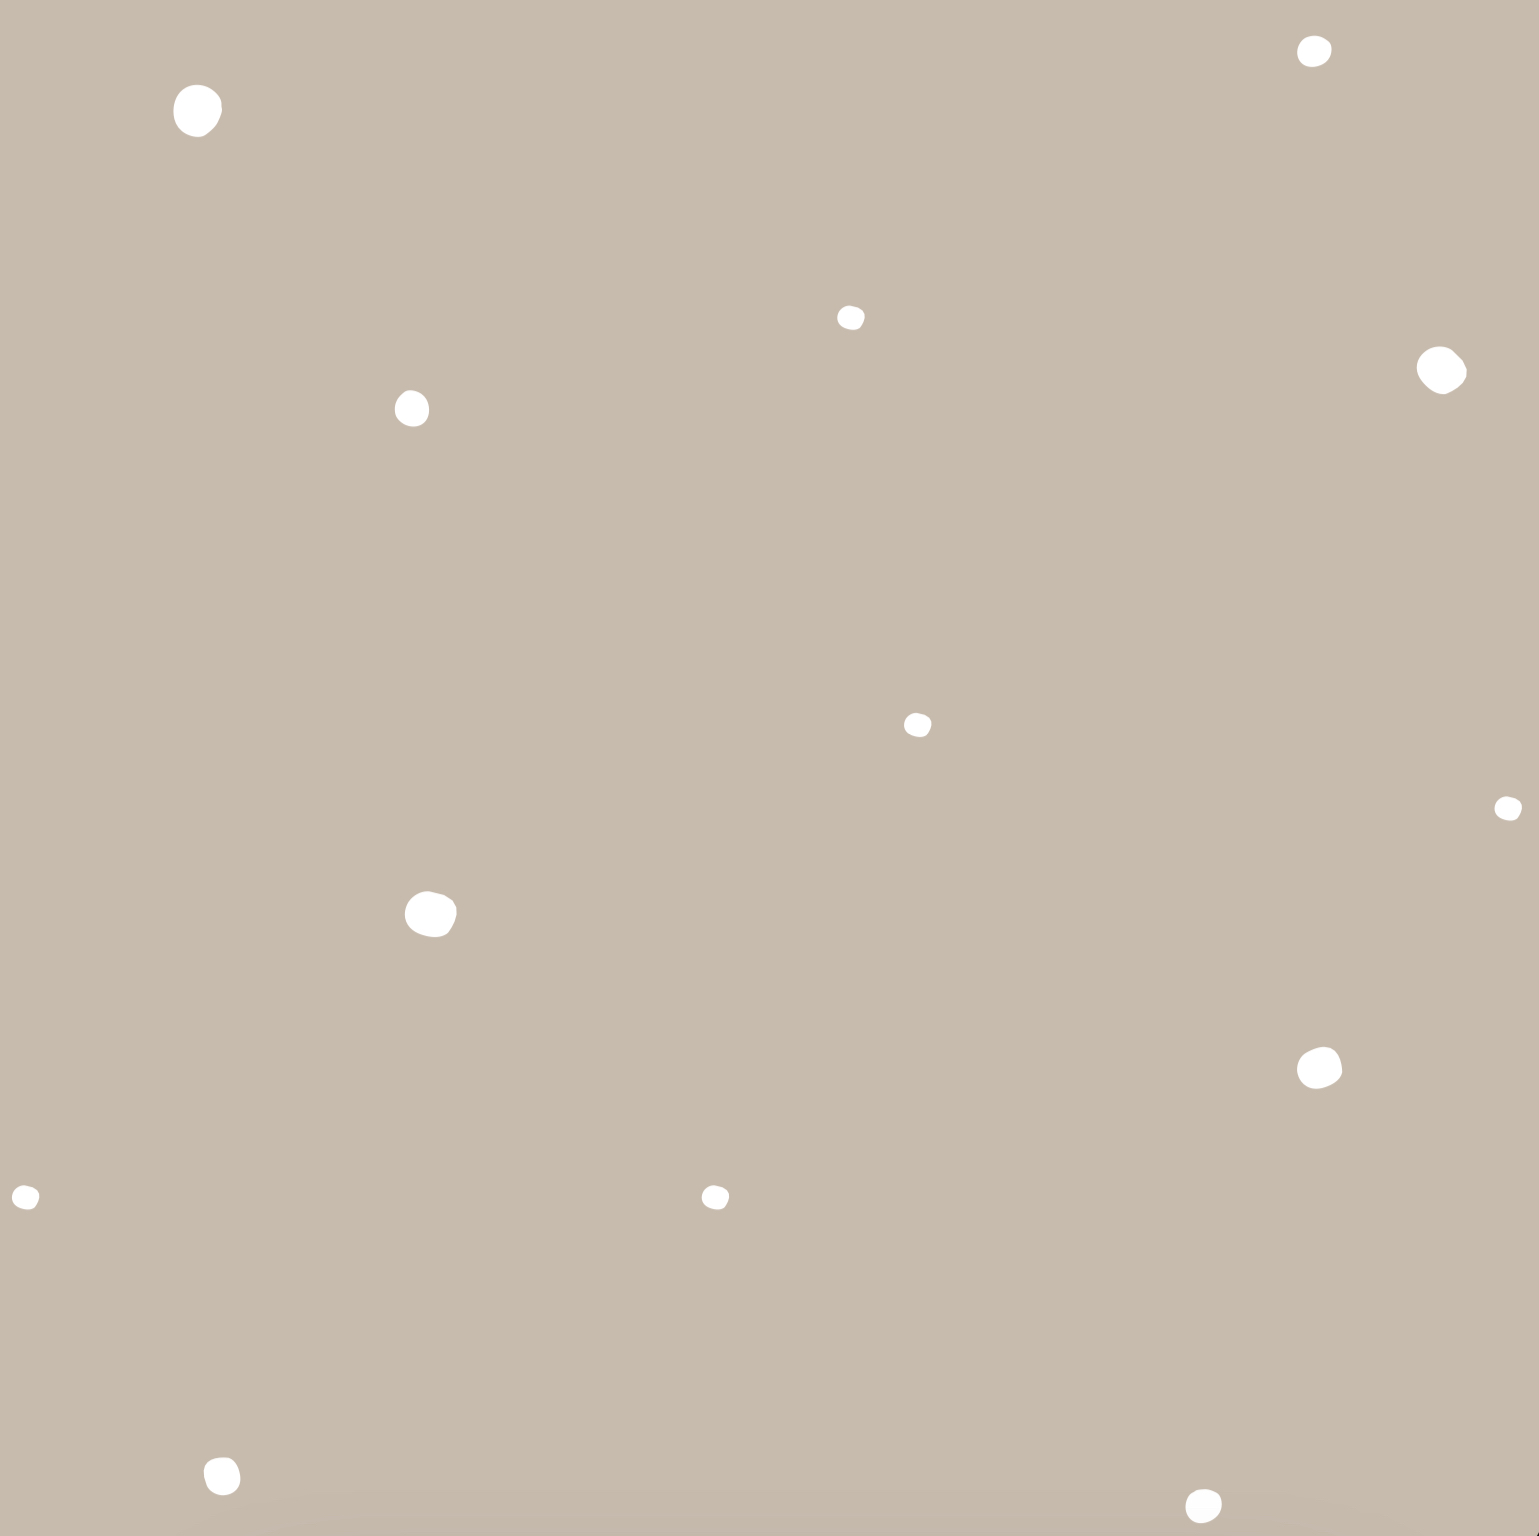 Papel pintado decorativo DOTS MINI fondo caliza dots blancos